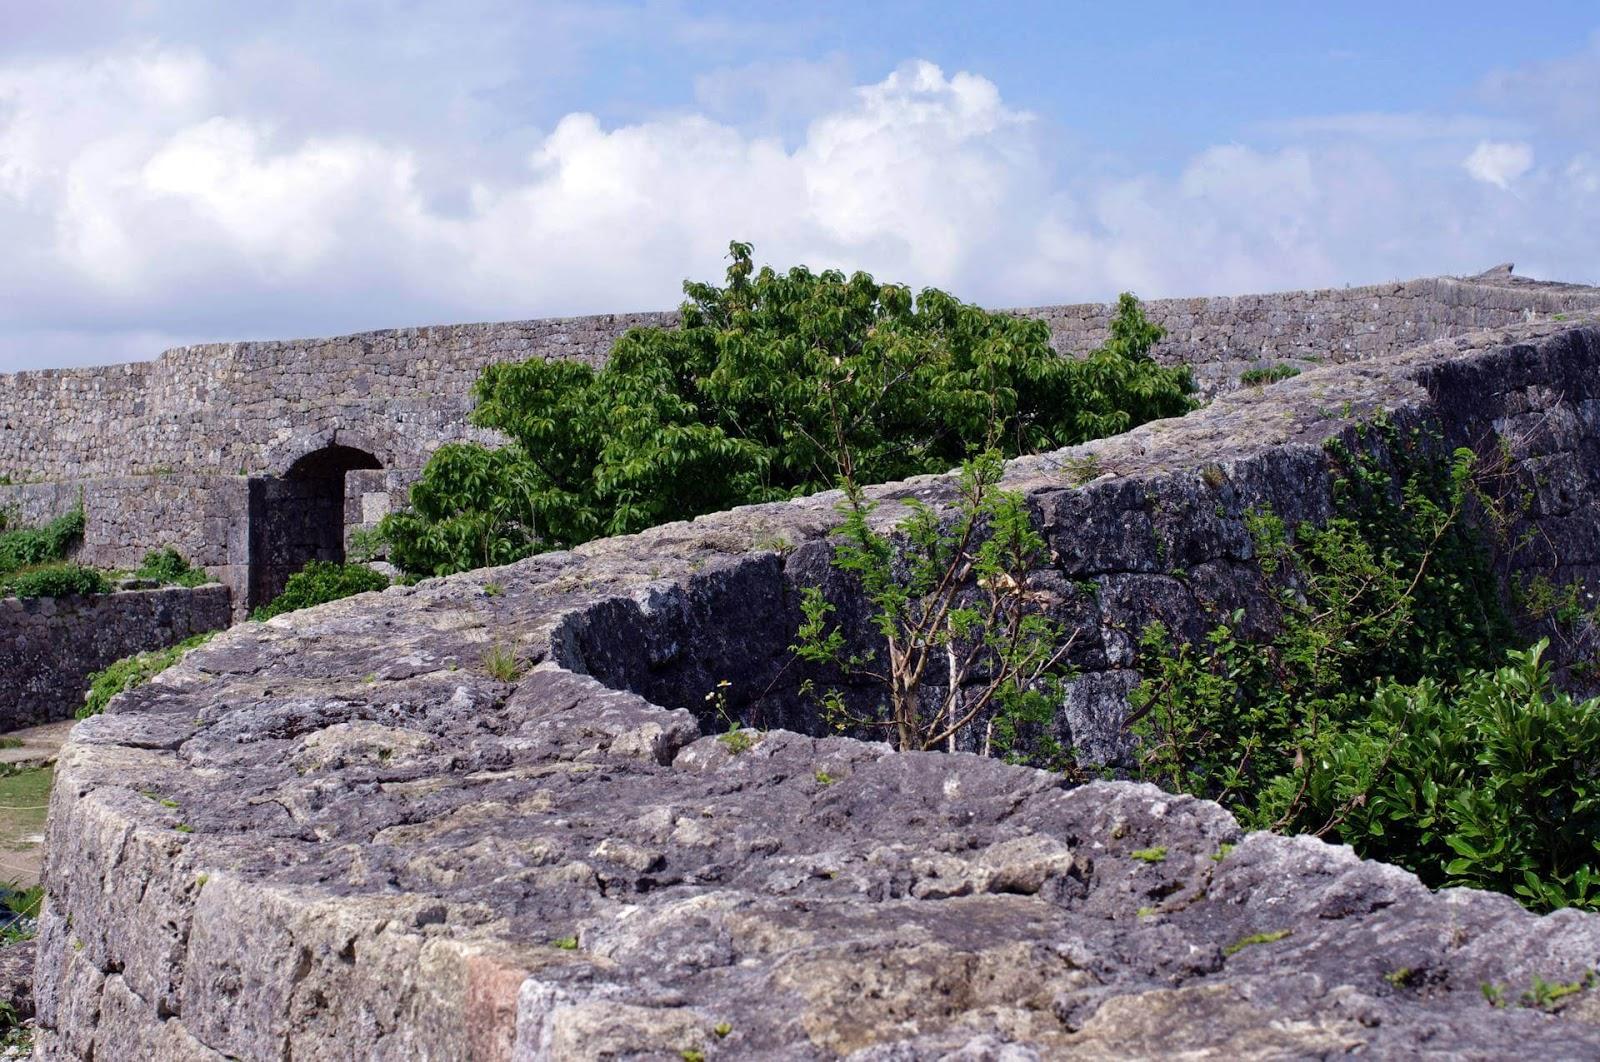 沖繩-世界遺產-中城城跡-nakagusukujo-ato-自由行-旅遊-景點-Okinawa-world-heritage